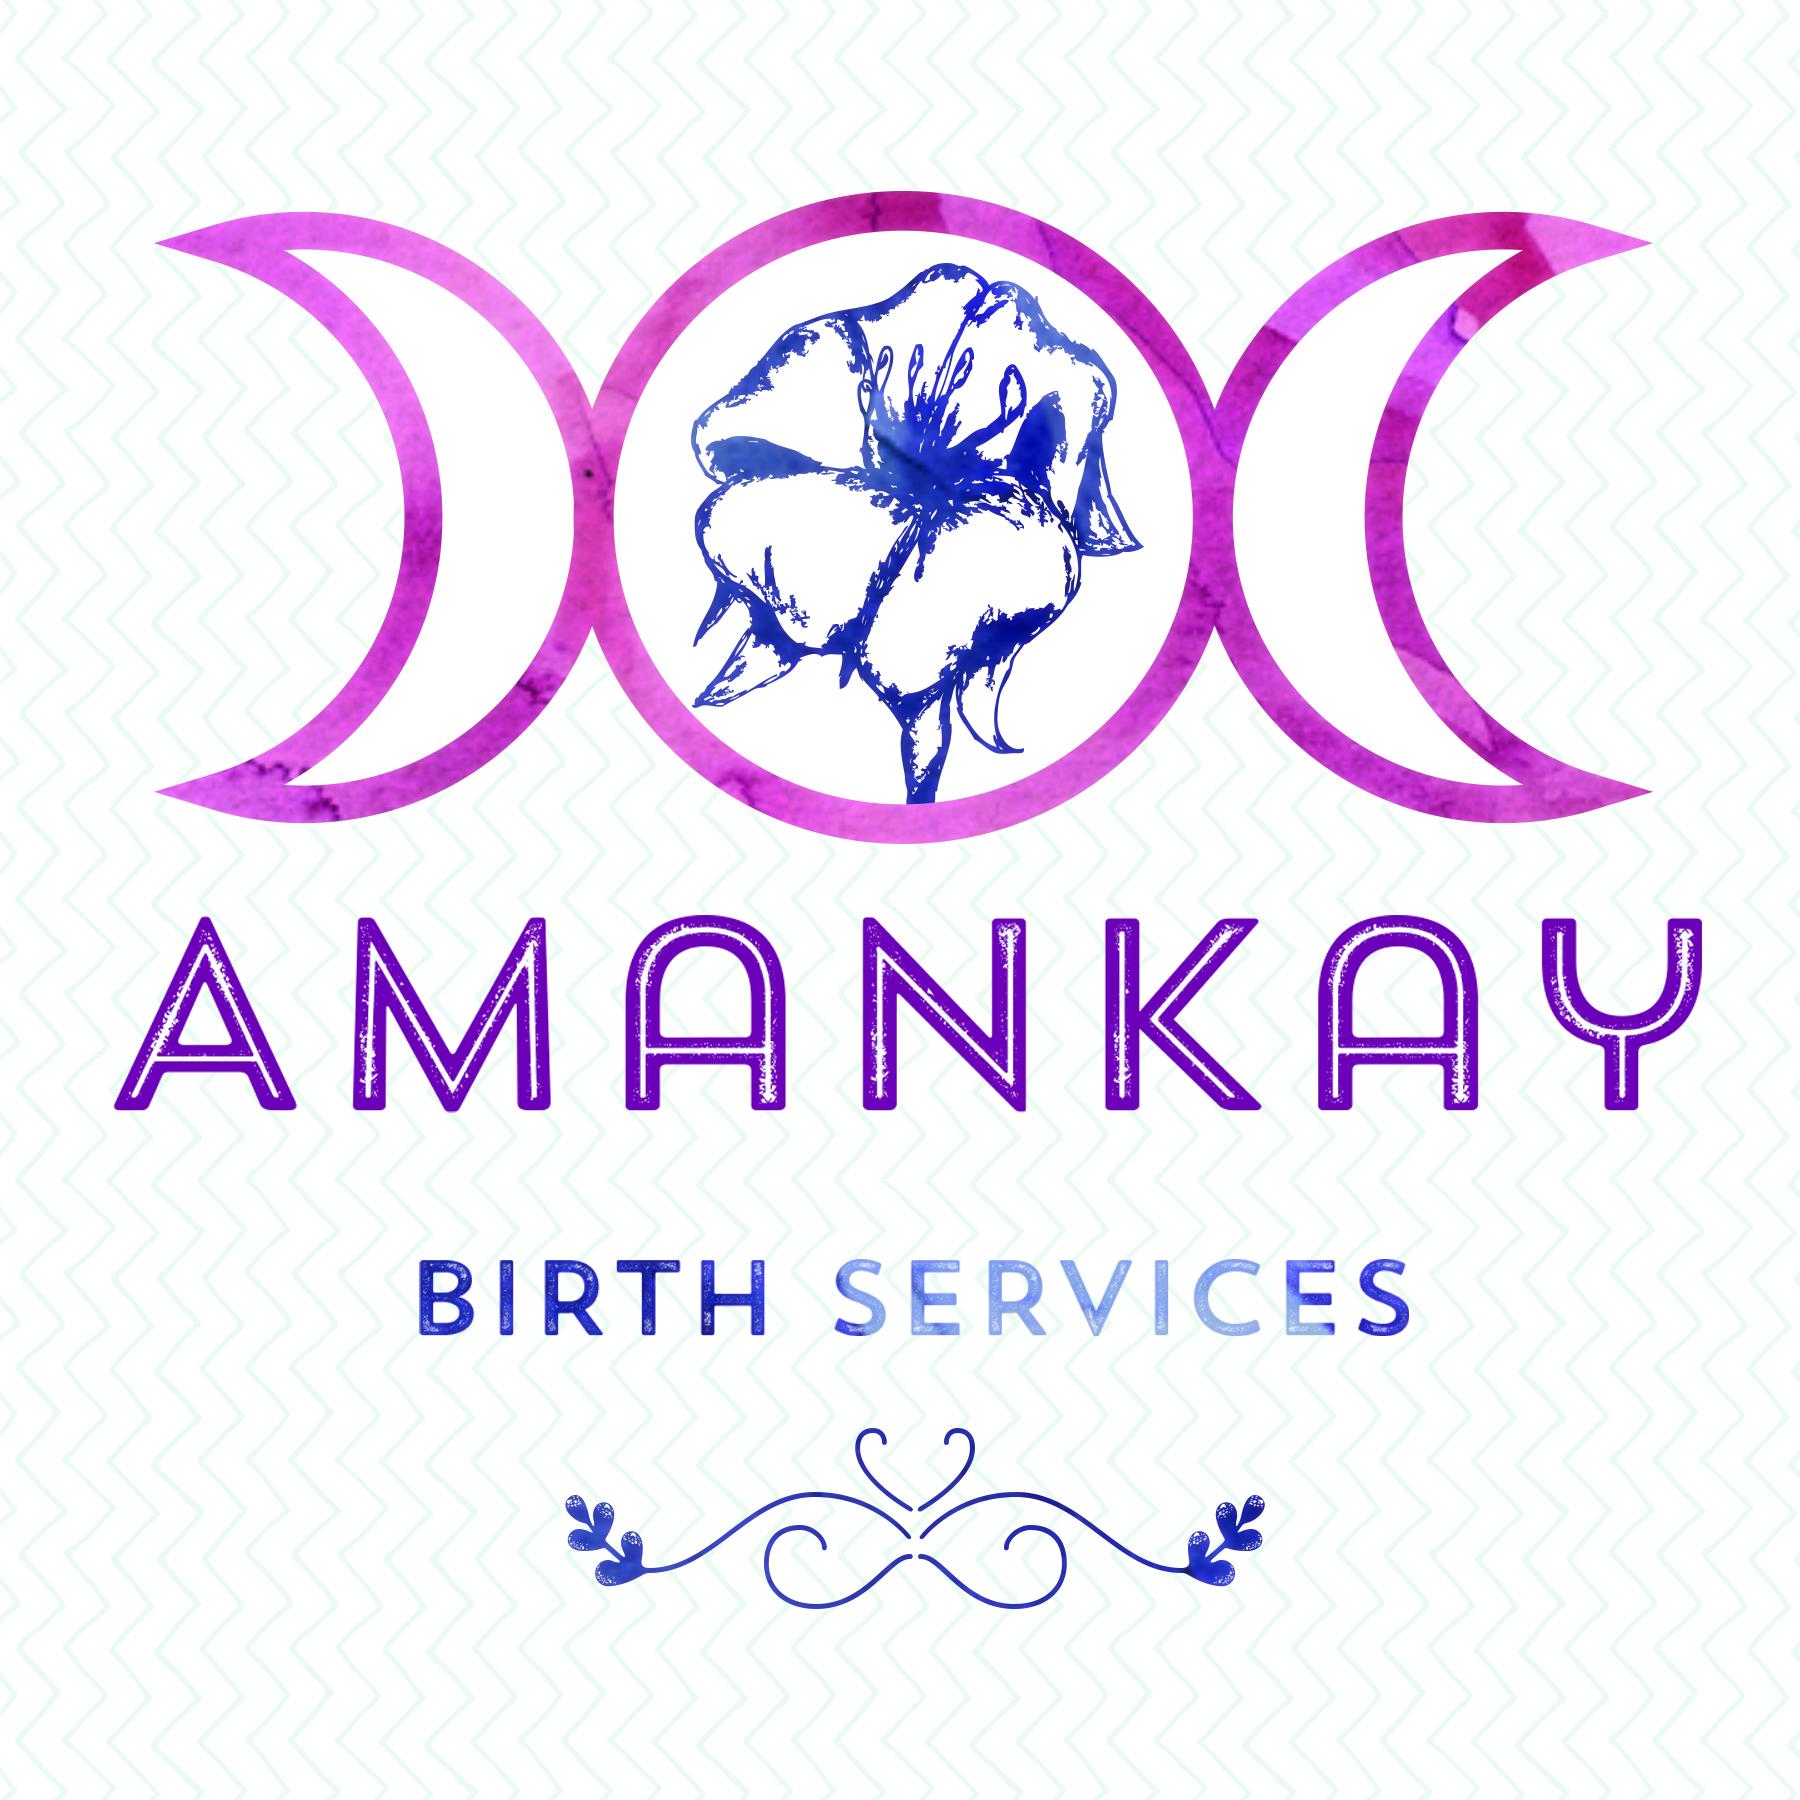 Amankay Birth Services Logo